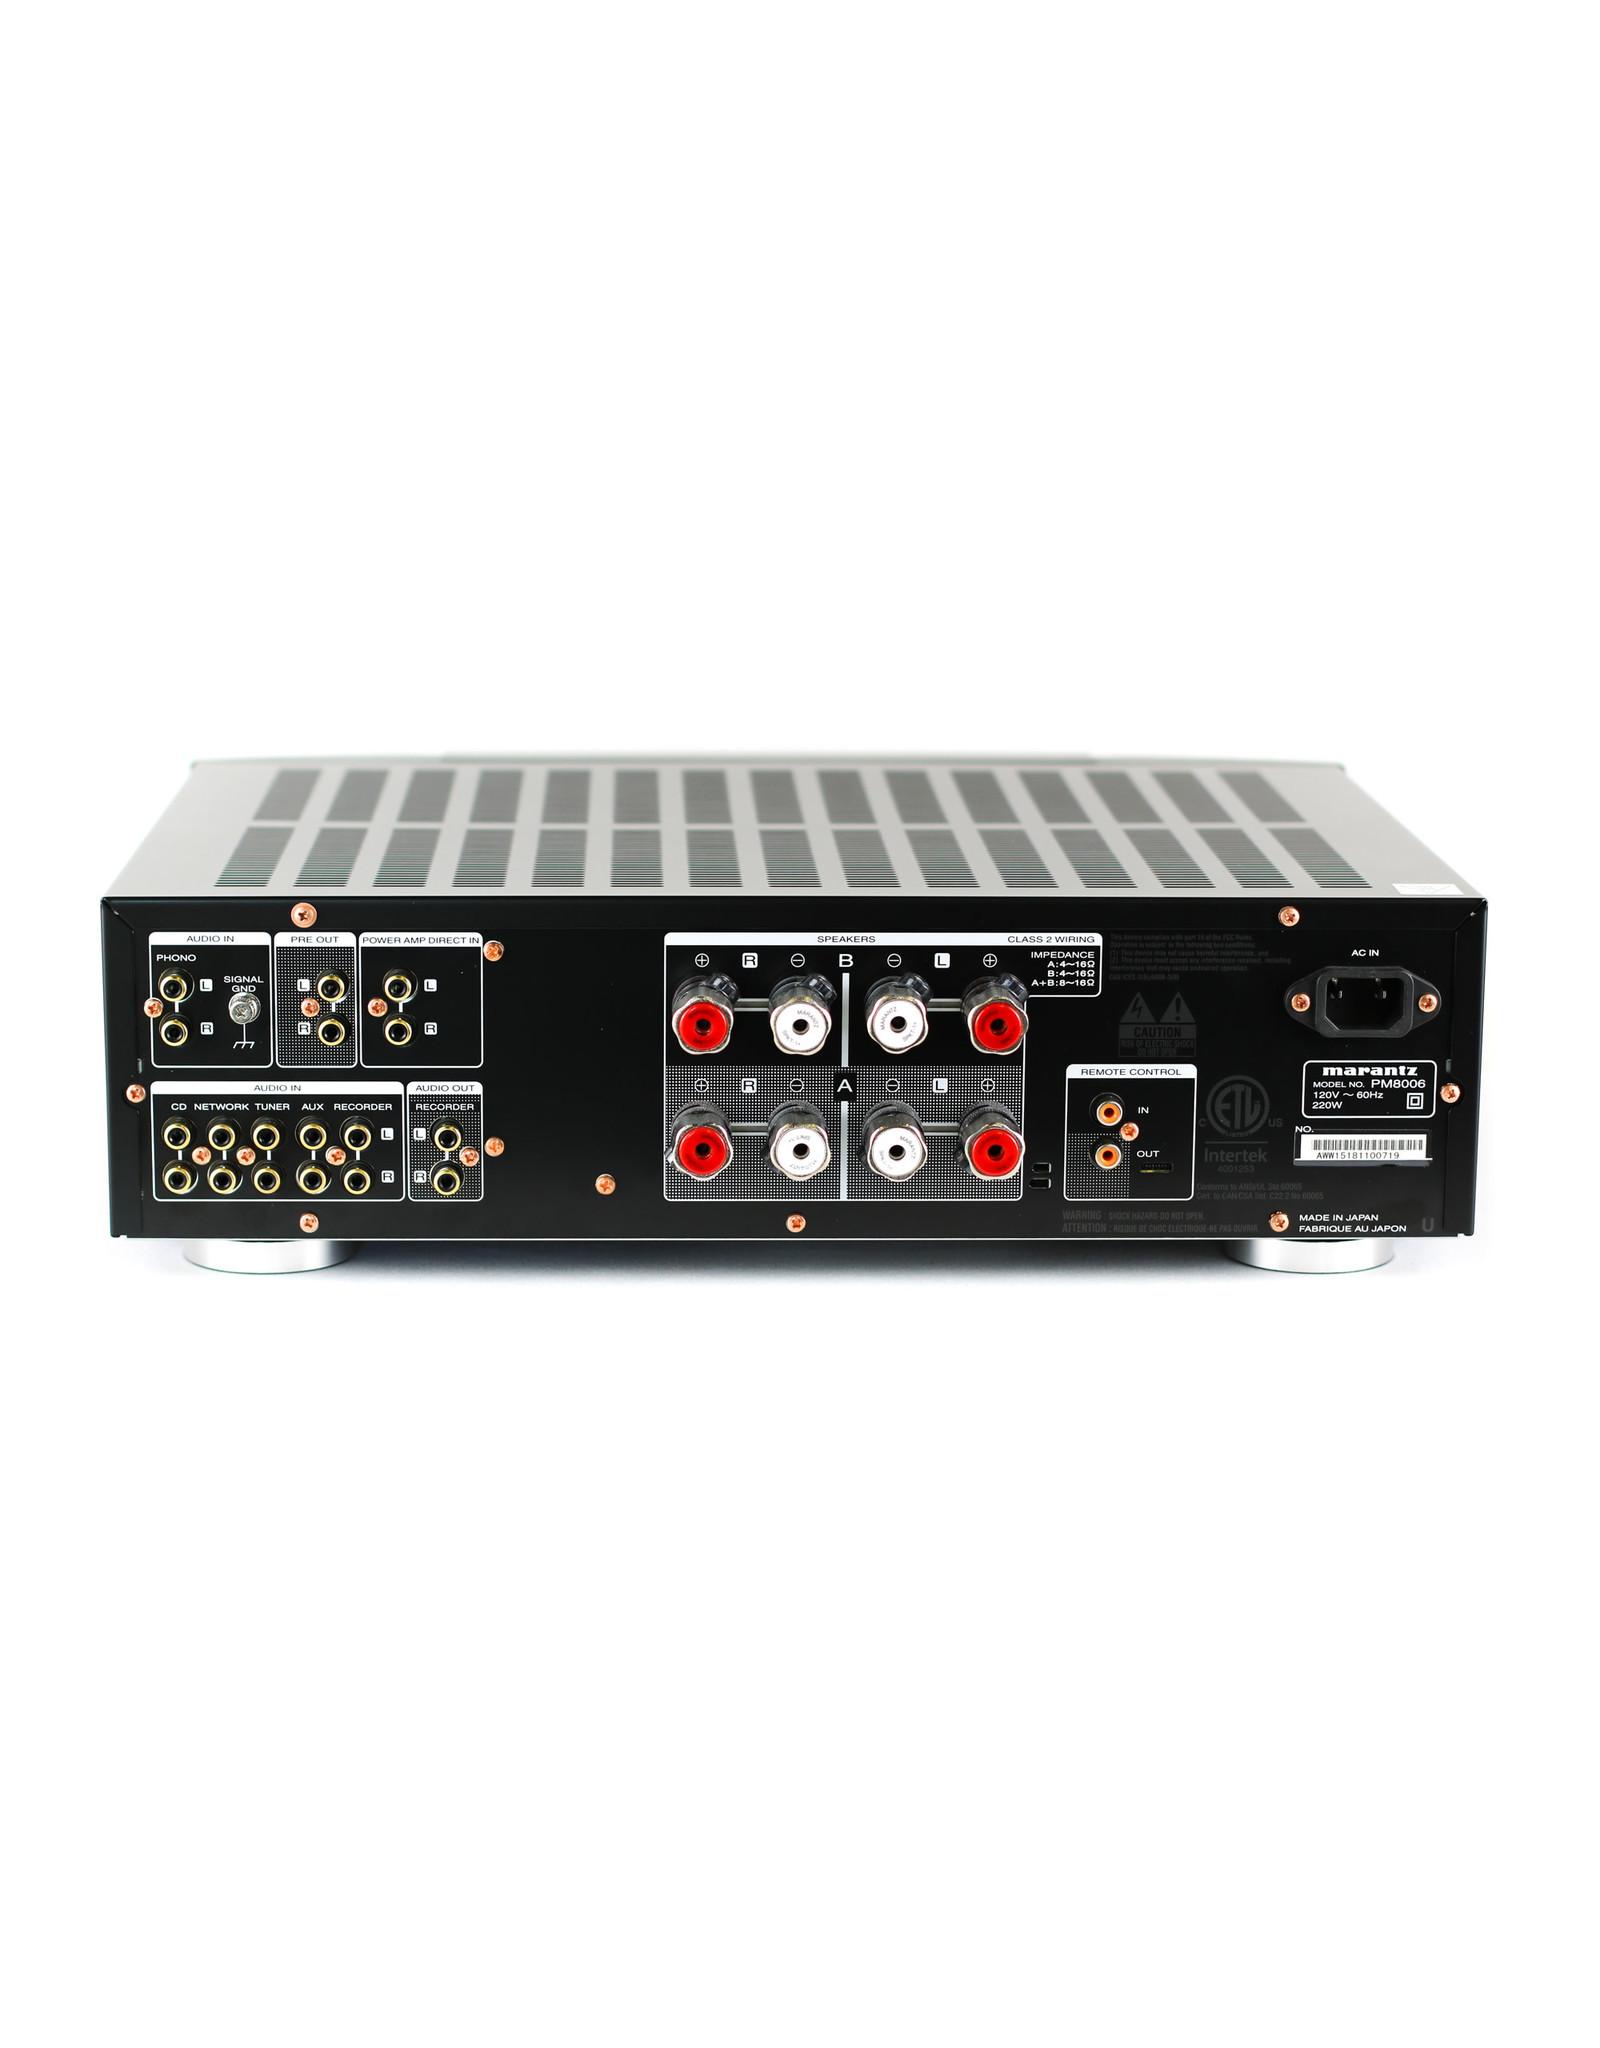 Marantz Marantz PM8006 Integrated Amplifier USED